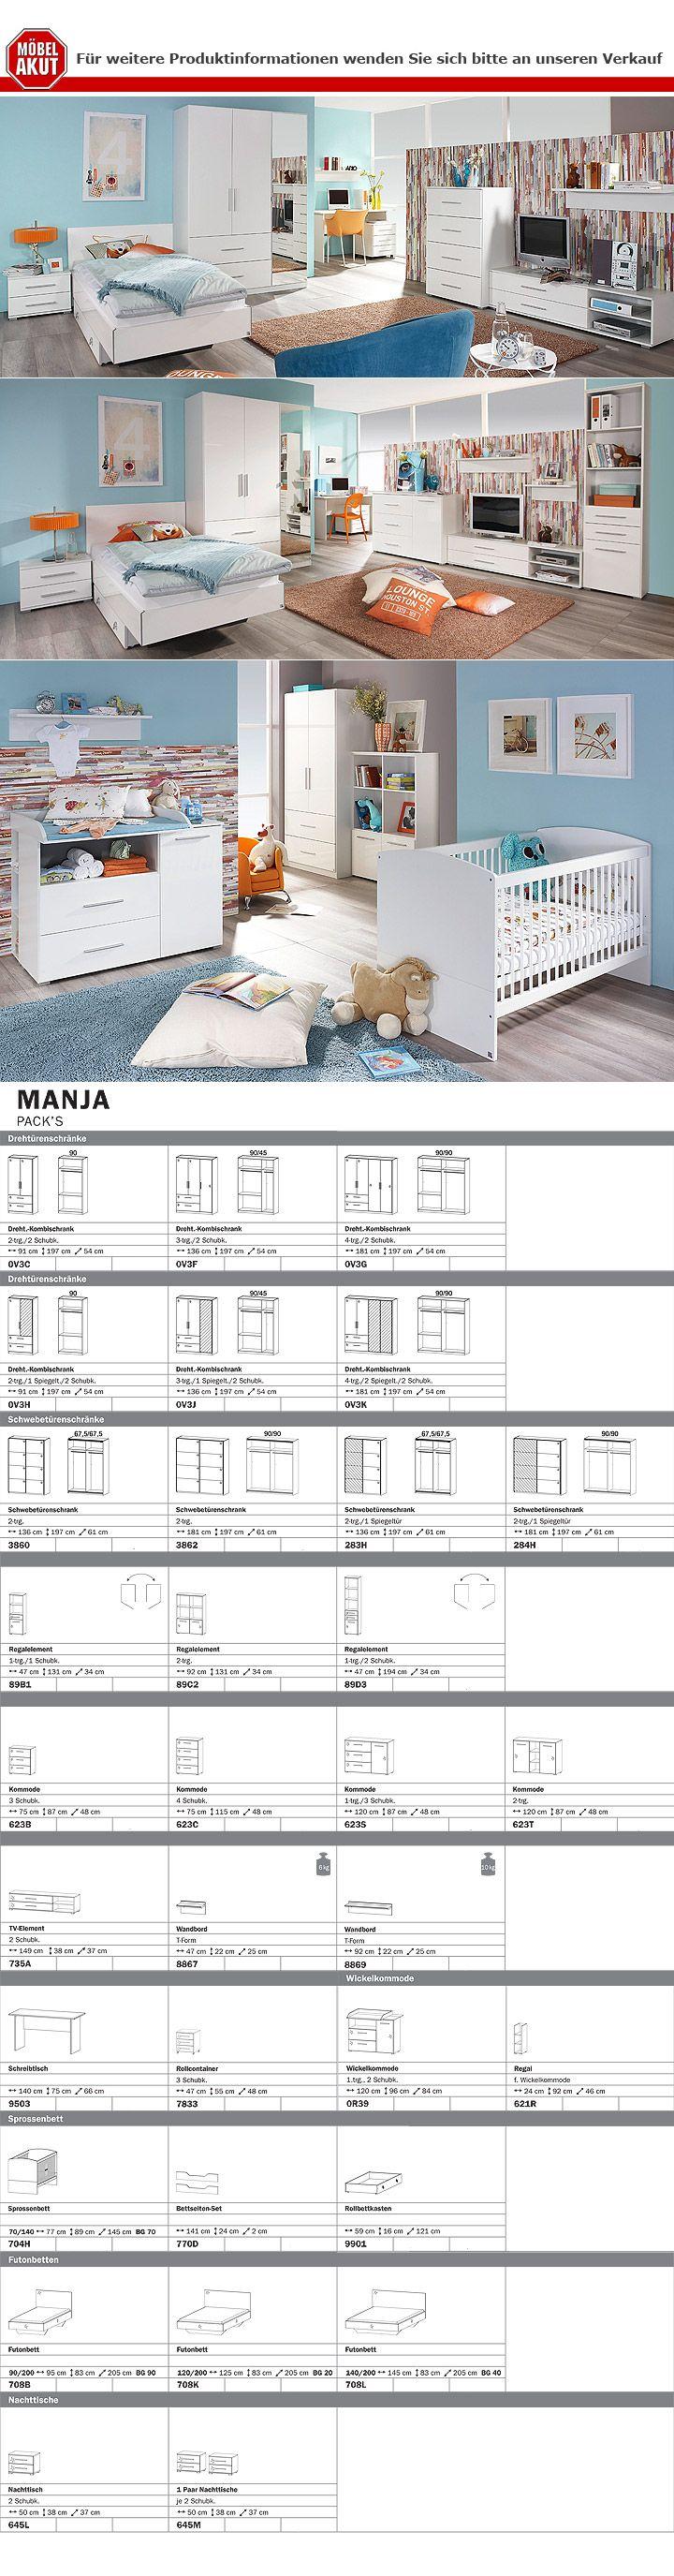 wohnkombi manja f r jugendzimmer wei hochglanz. Black Bedroom Furniture Sets. Home Design Ideas